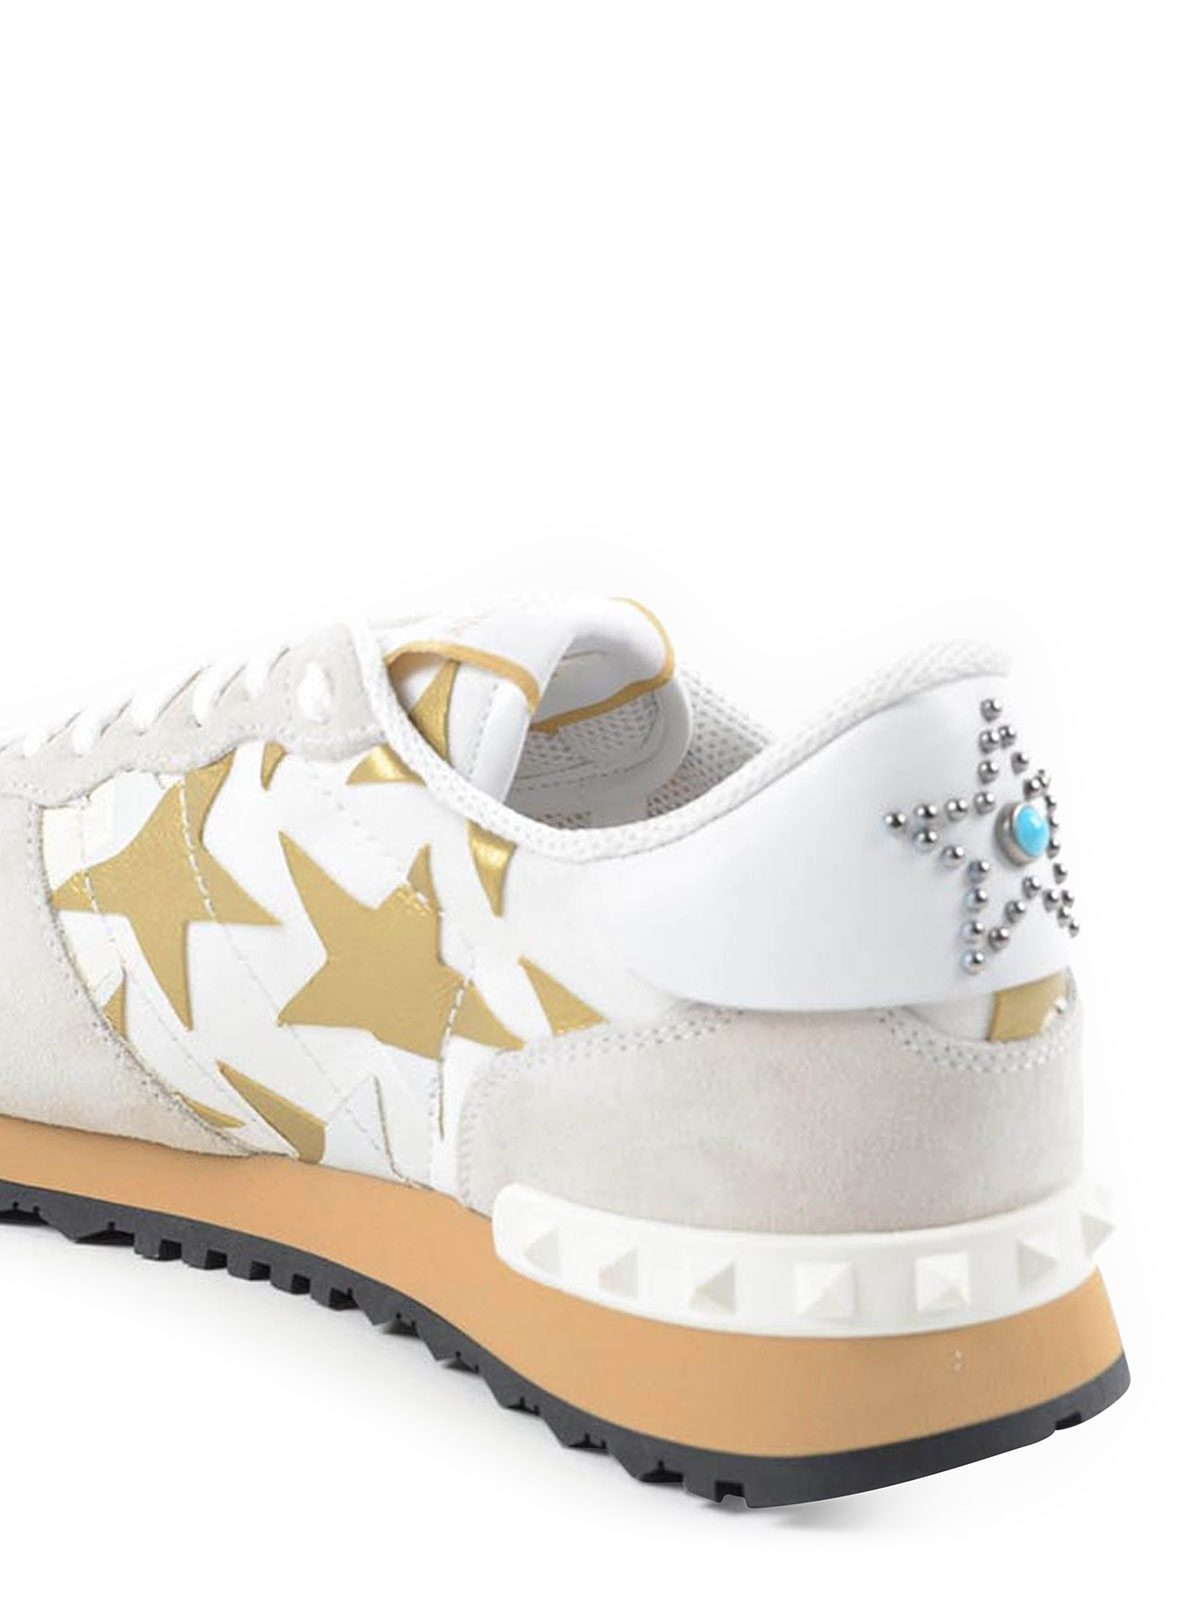 Chaussures Pour Femme Blanc De Garavani Baskets Valentino Sport RqUXZF